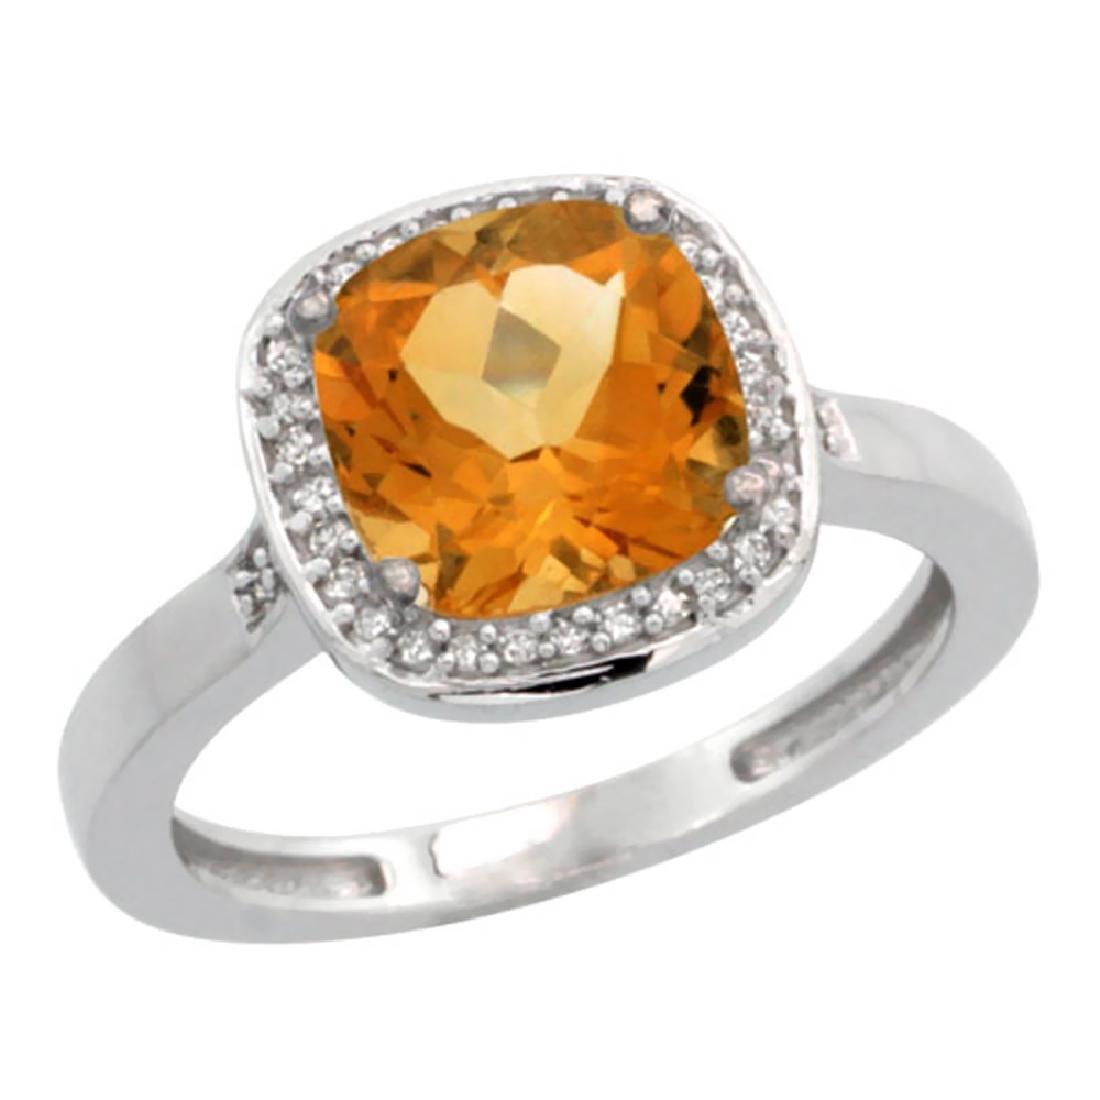 Natural 3.94 ctw Citrine & Diamond Engagement Ring 10K